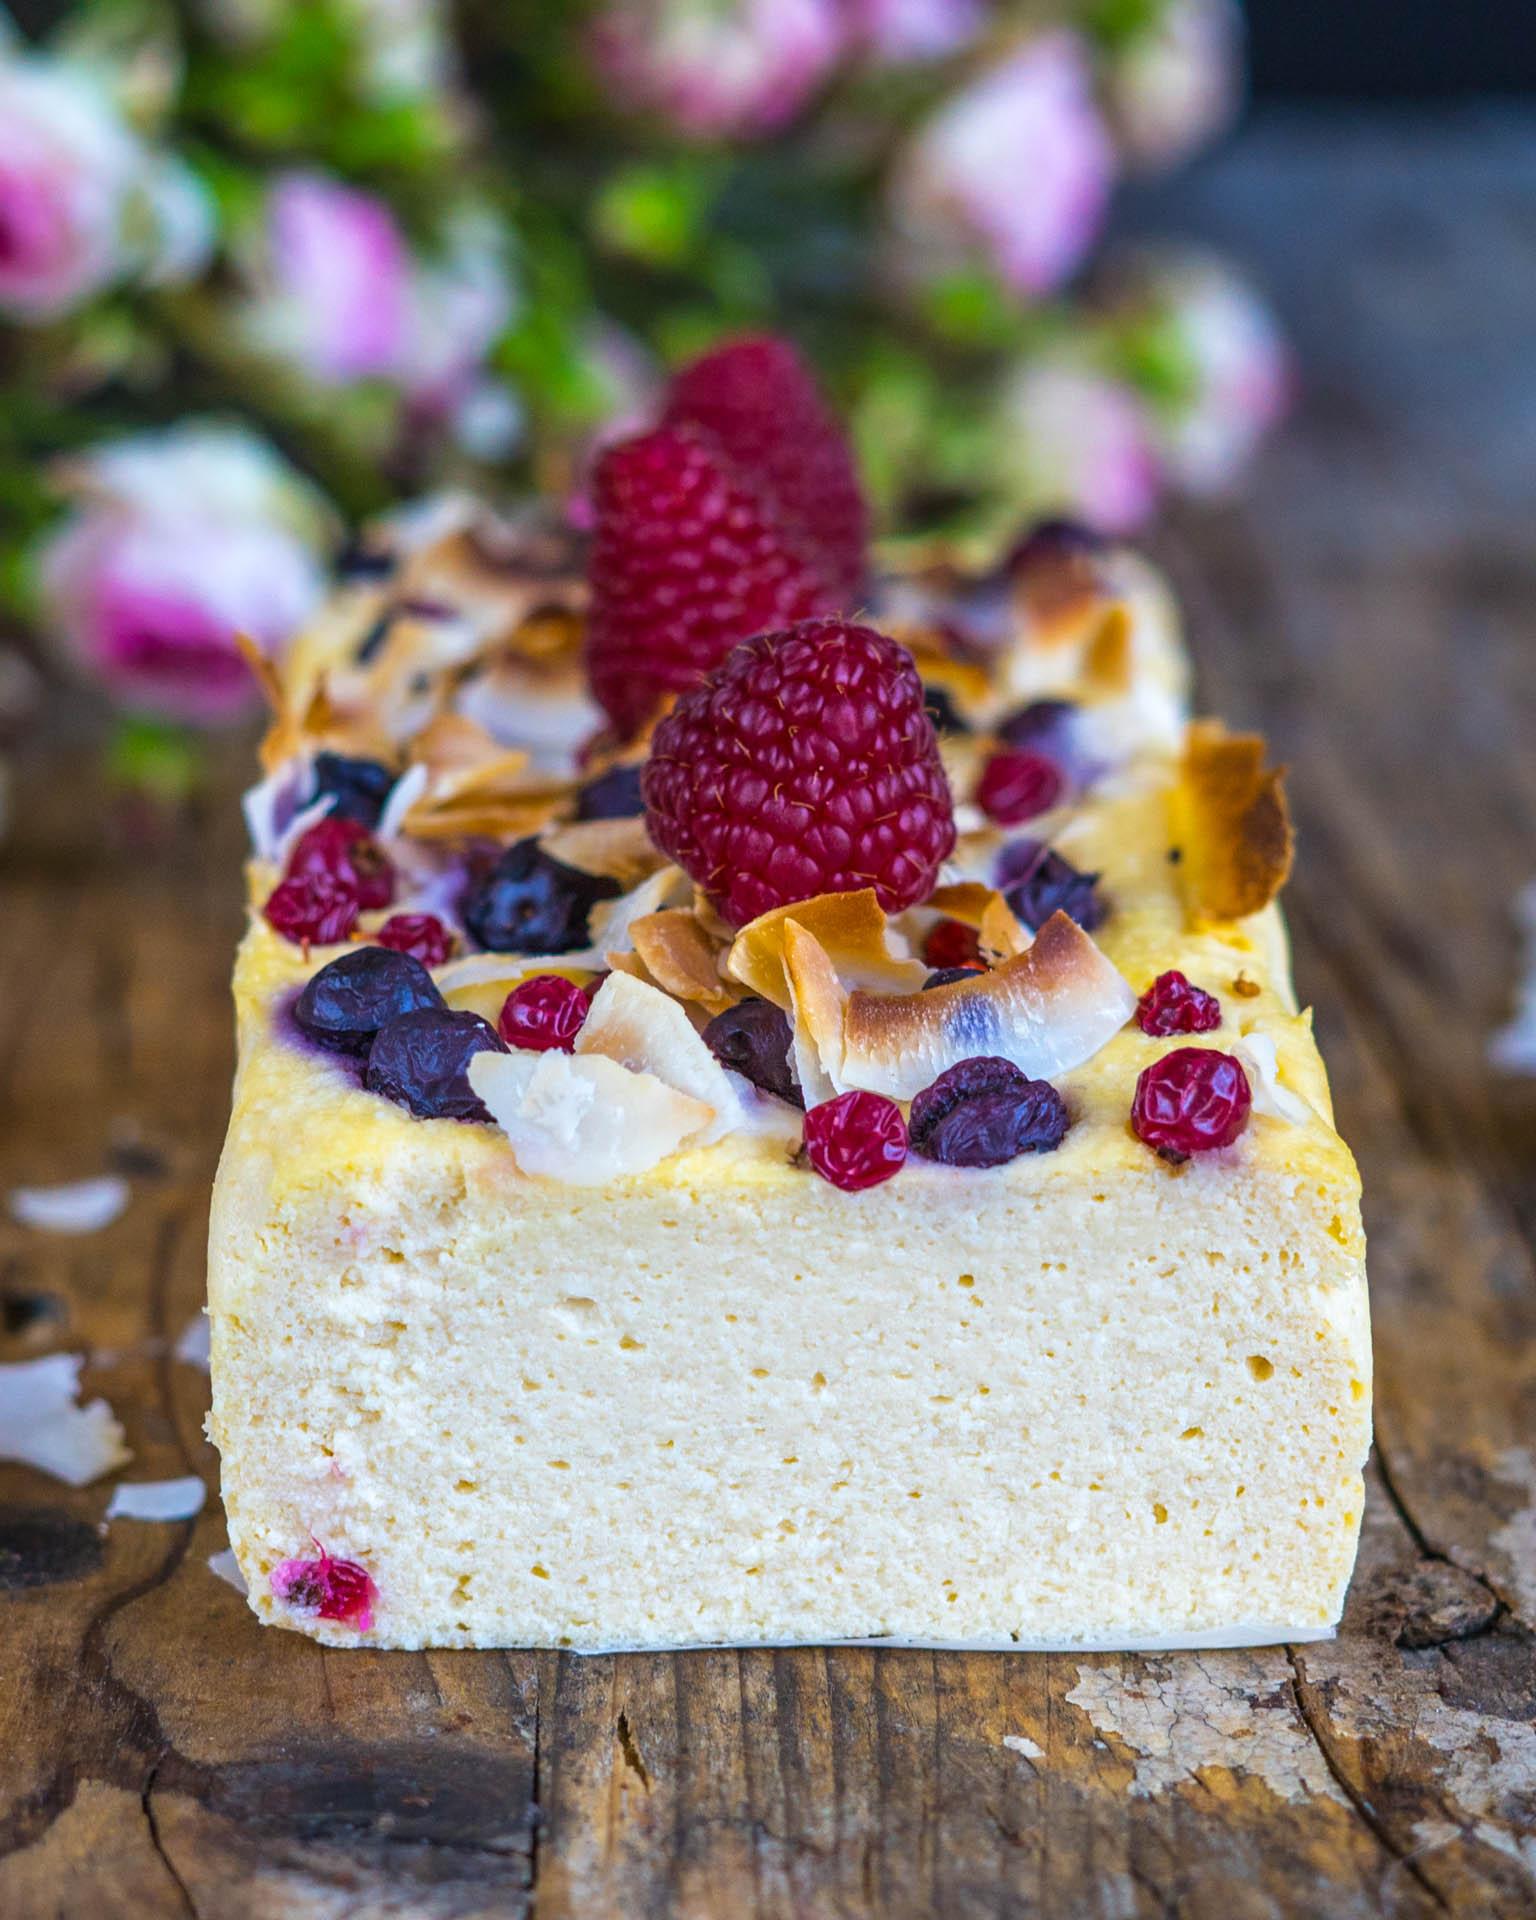 Low Carb Cheesecake Keto geeignet, zuckerfrei Mrs Flury